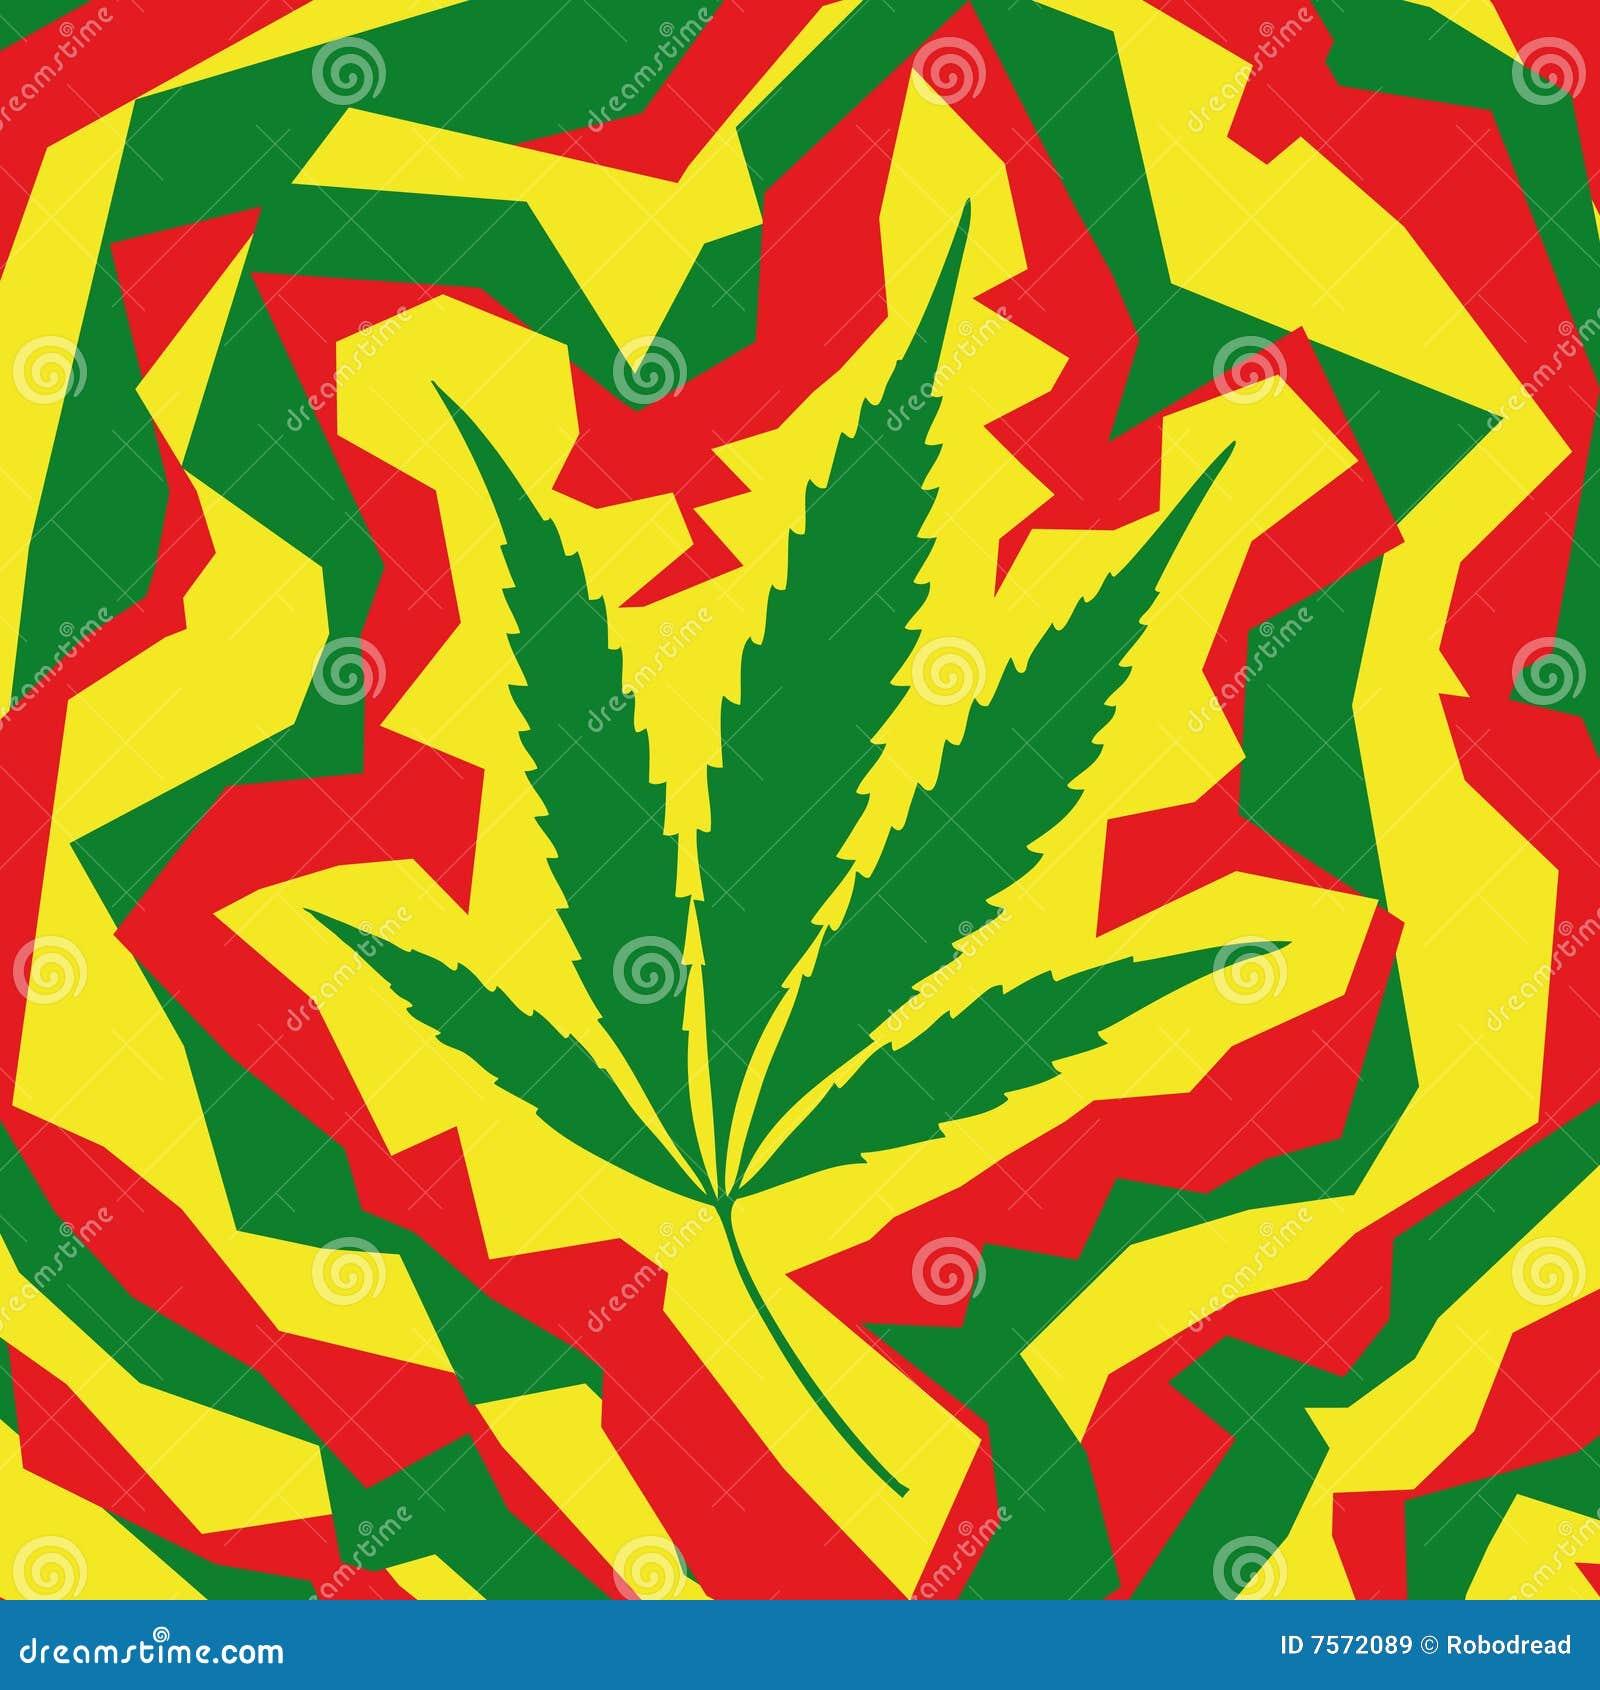 Marijuana Leaf Vector Royalty Free Stock Images Image